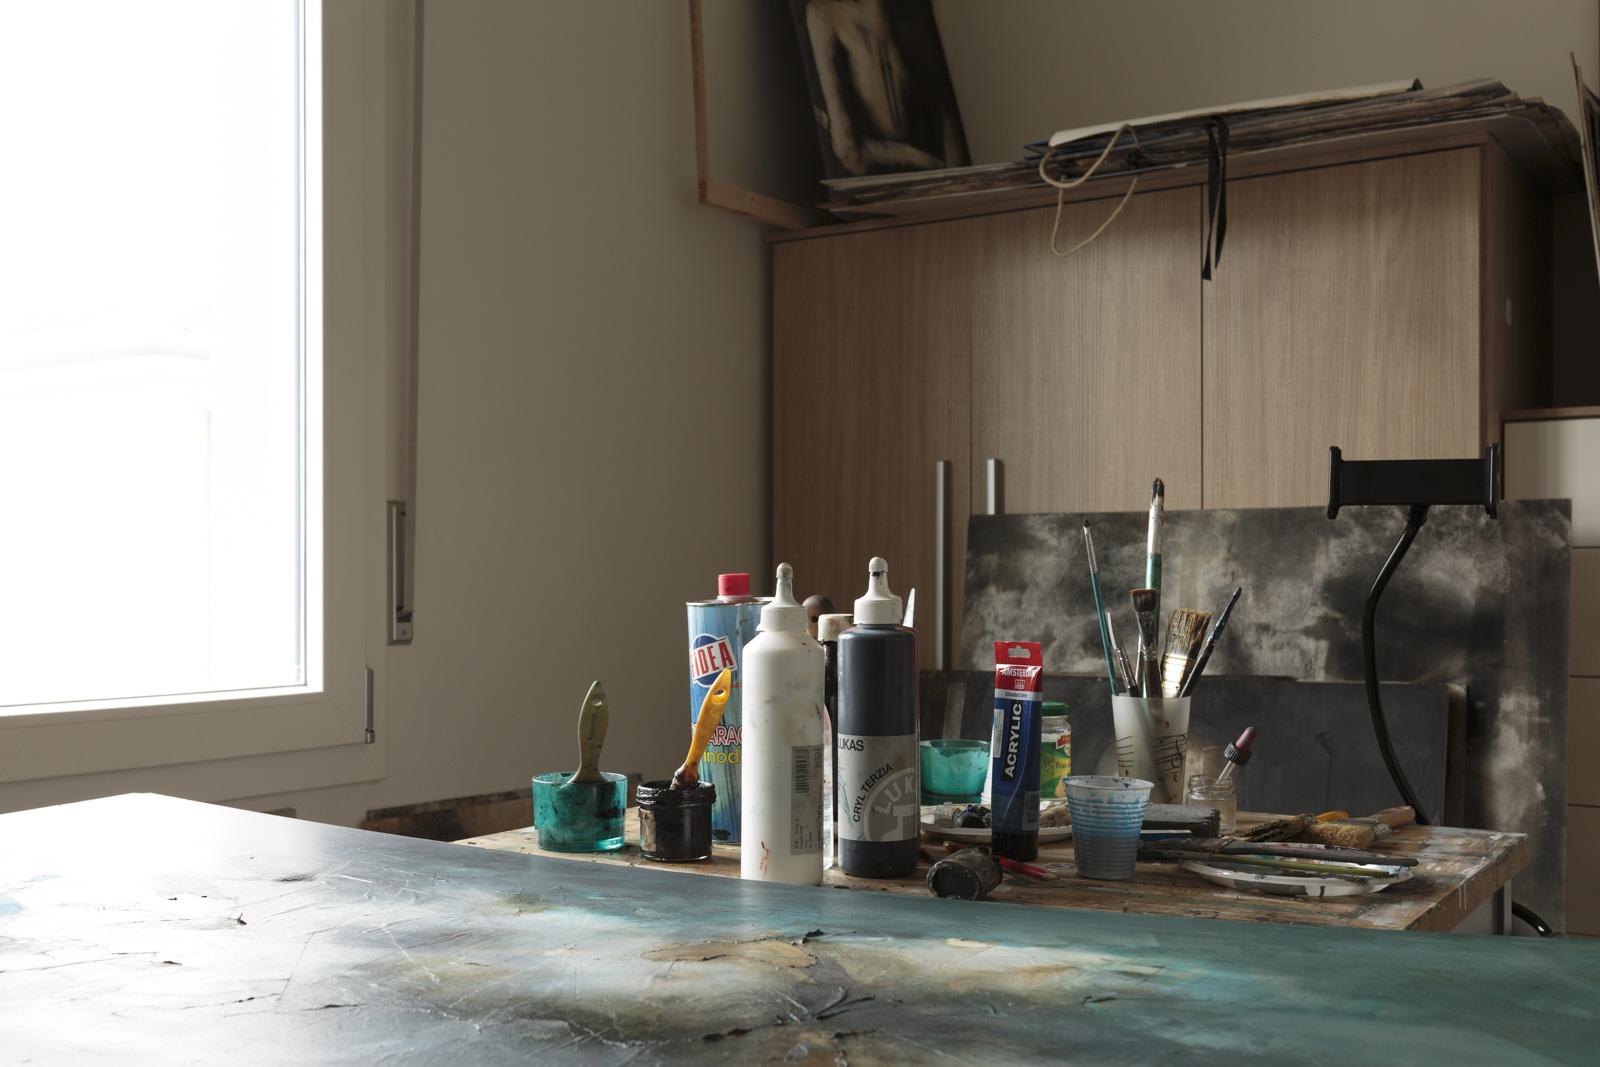 massarrotti marco studio visit mocu modena cultura